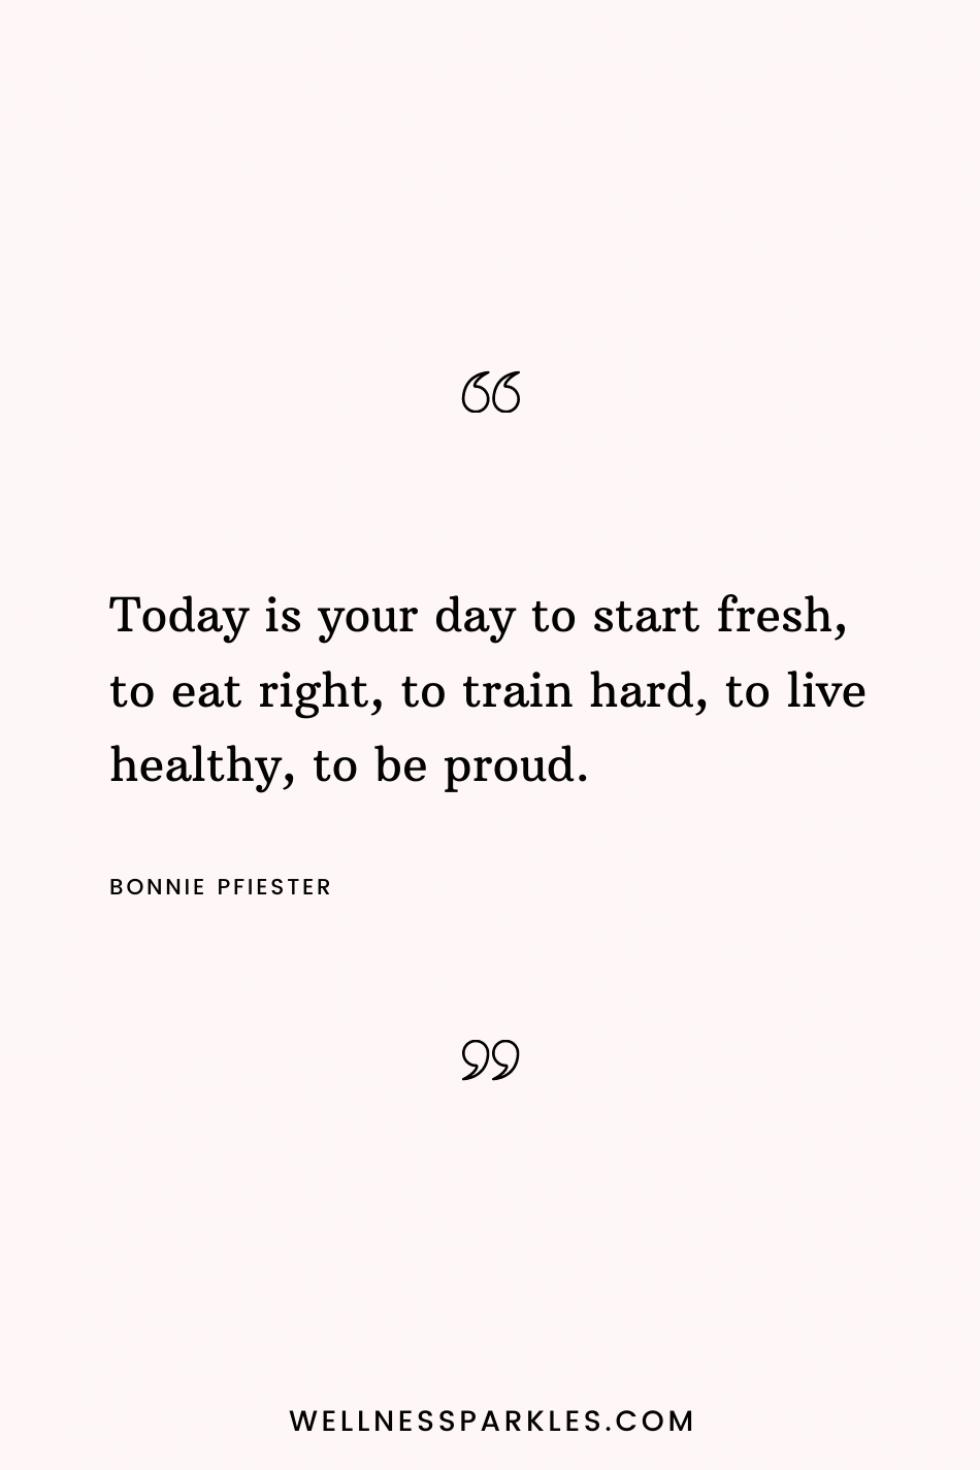 Ready To Start Your Journey Towards Wellness?